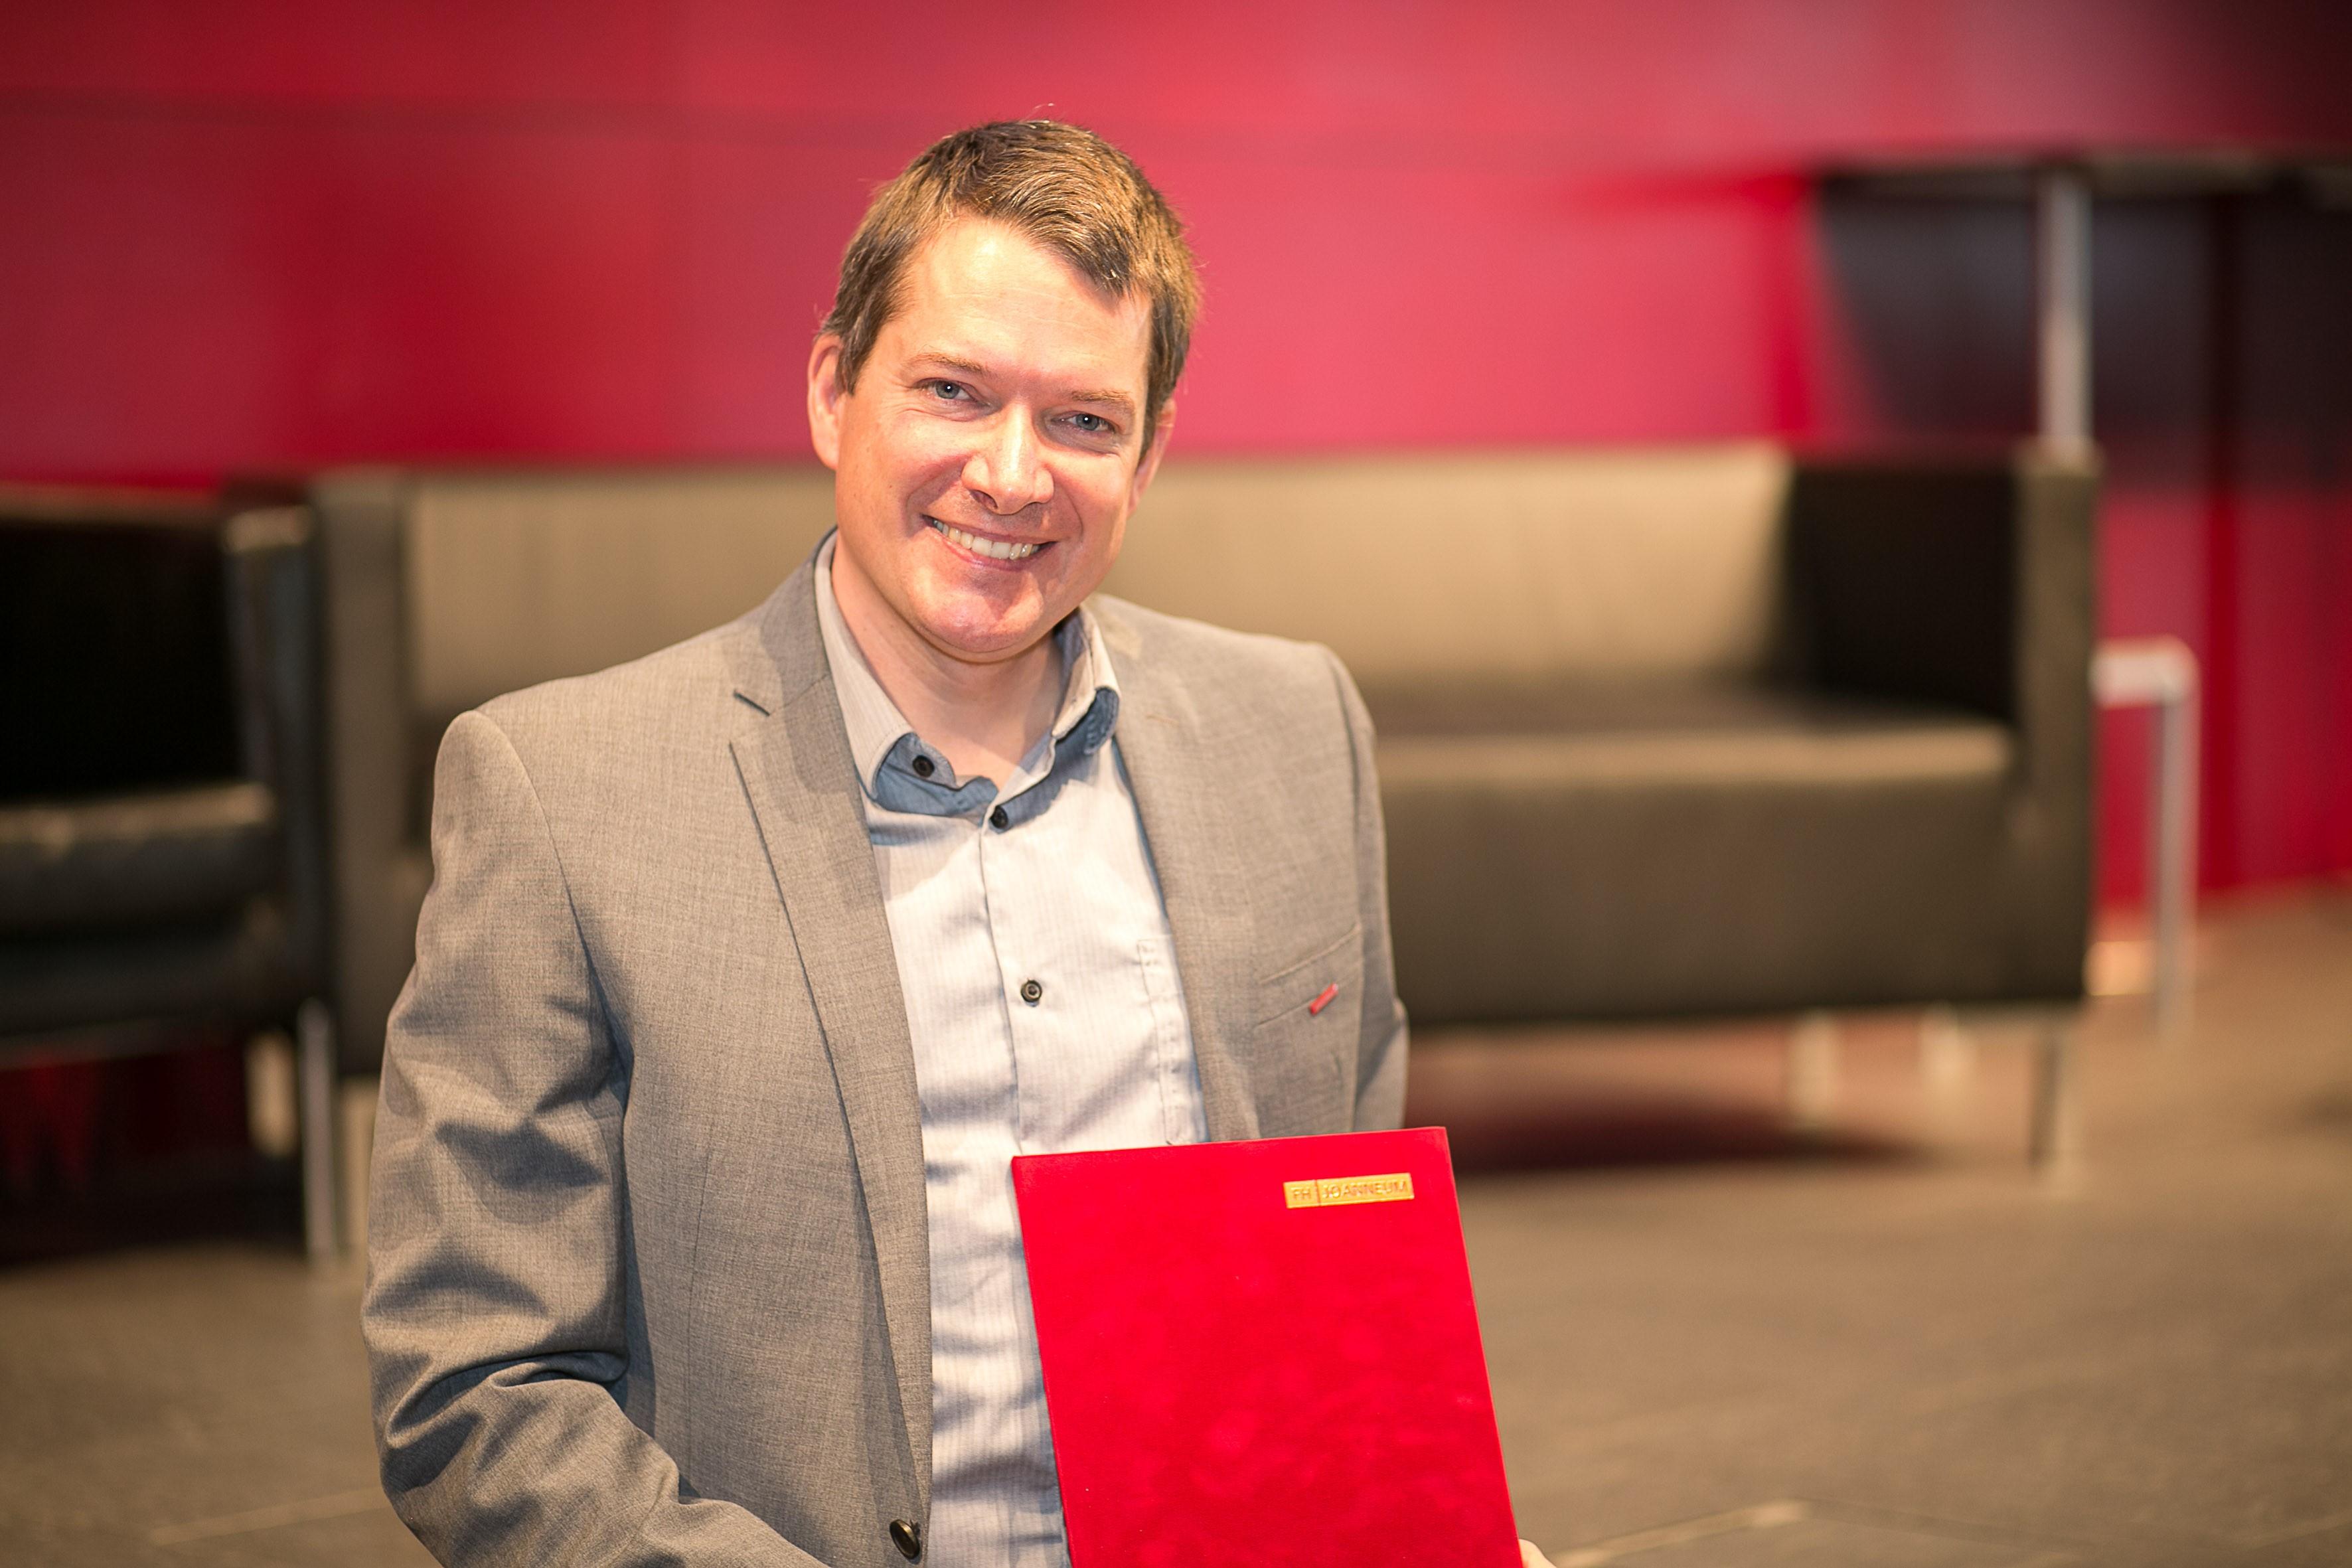 Wilhelm Zugaj erhält den Teaching Award 2018.